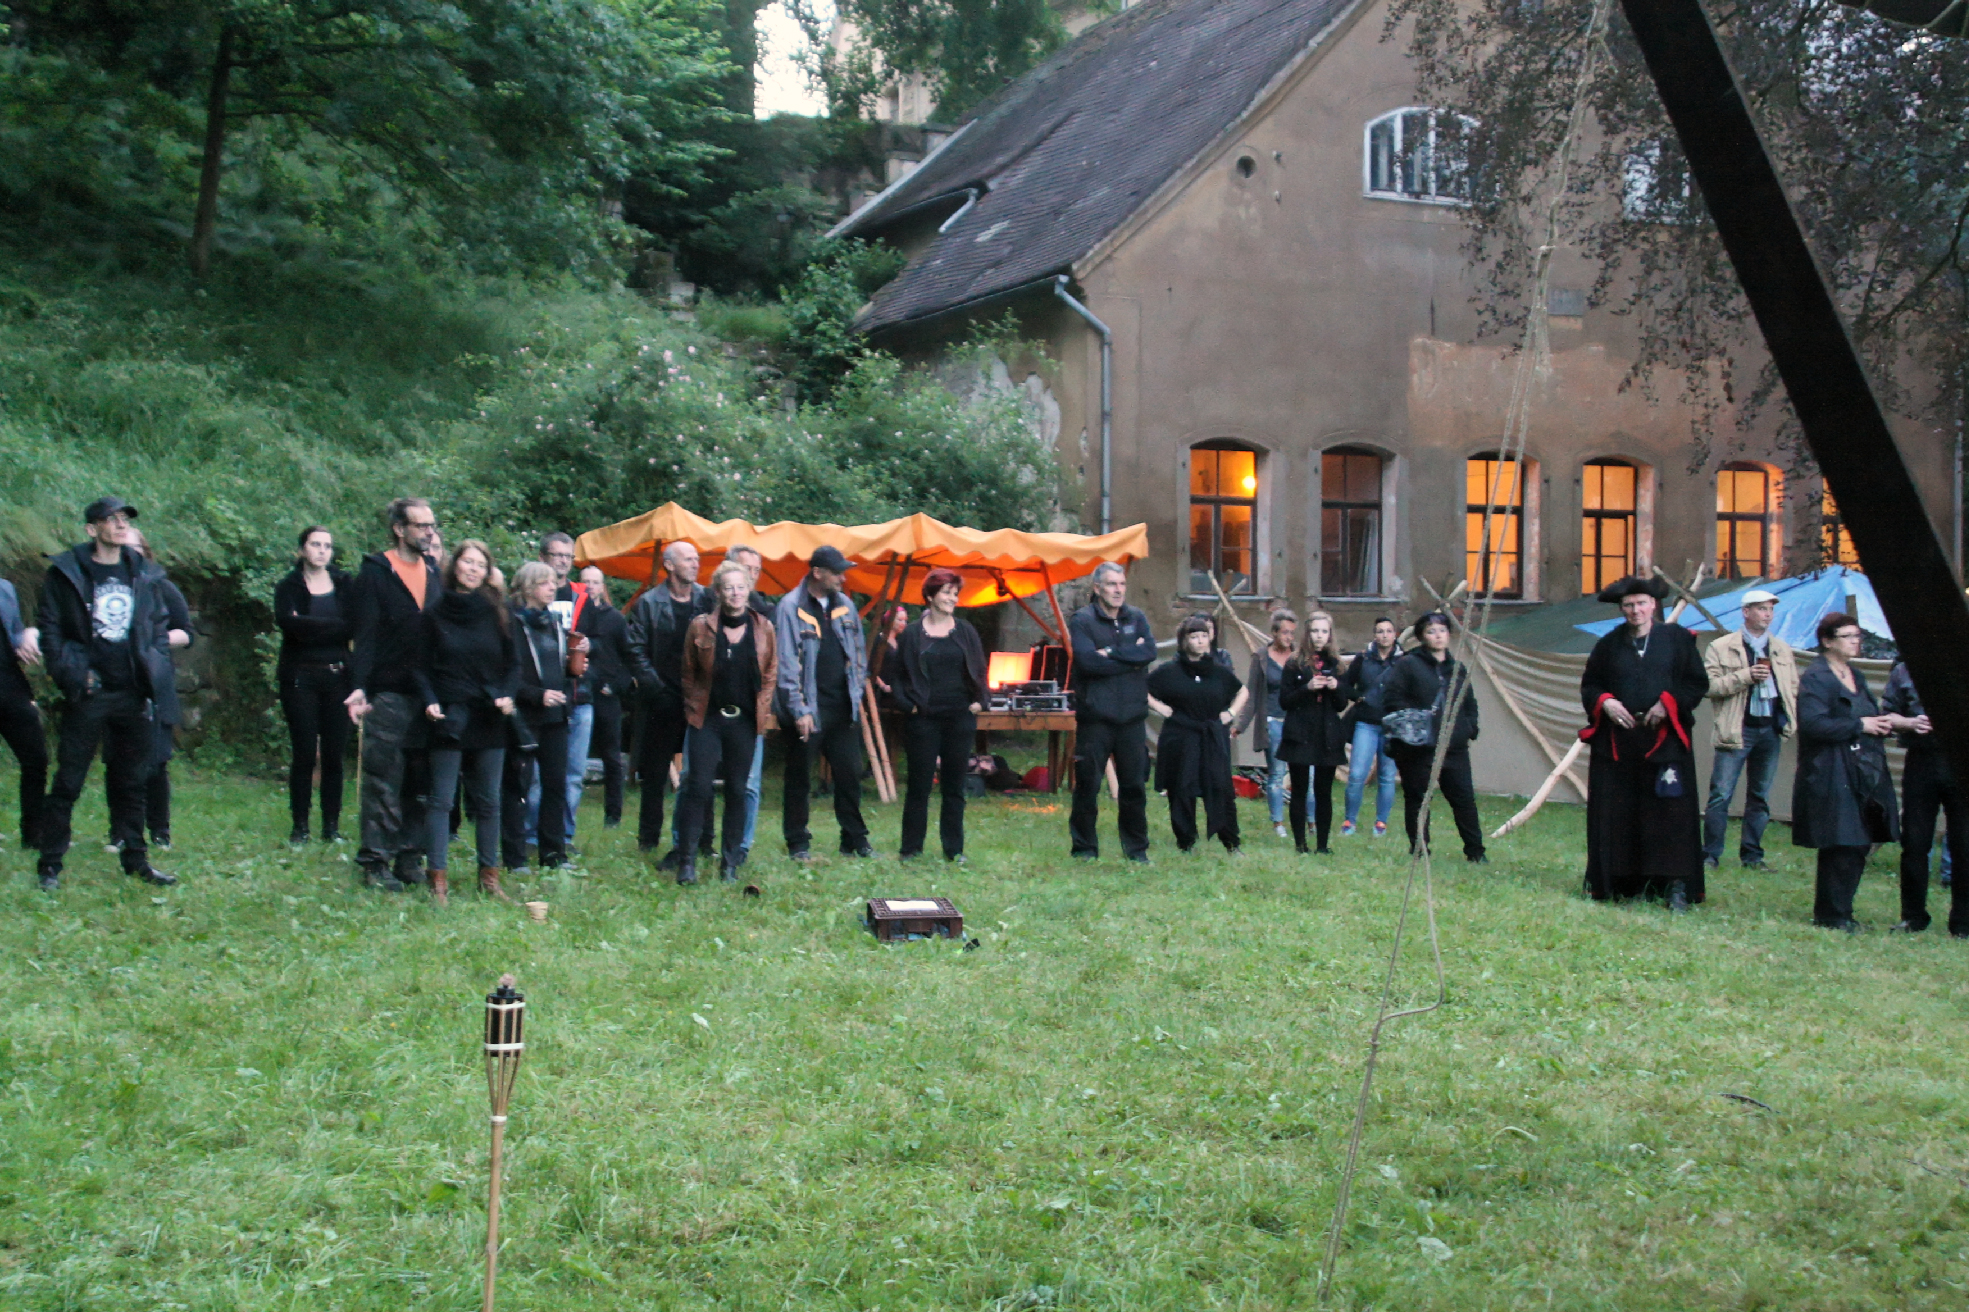 IMG_8853Schlossfest-Hainewalde-2016